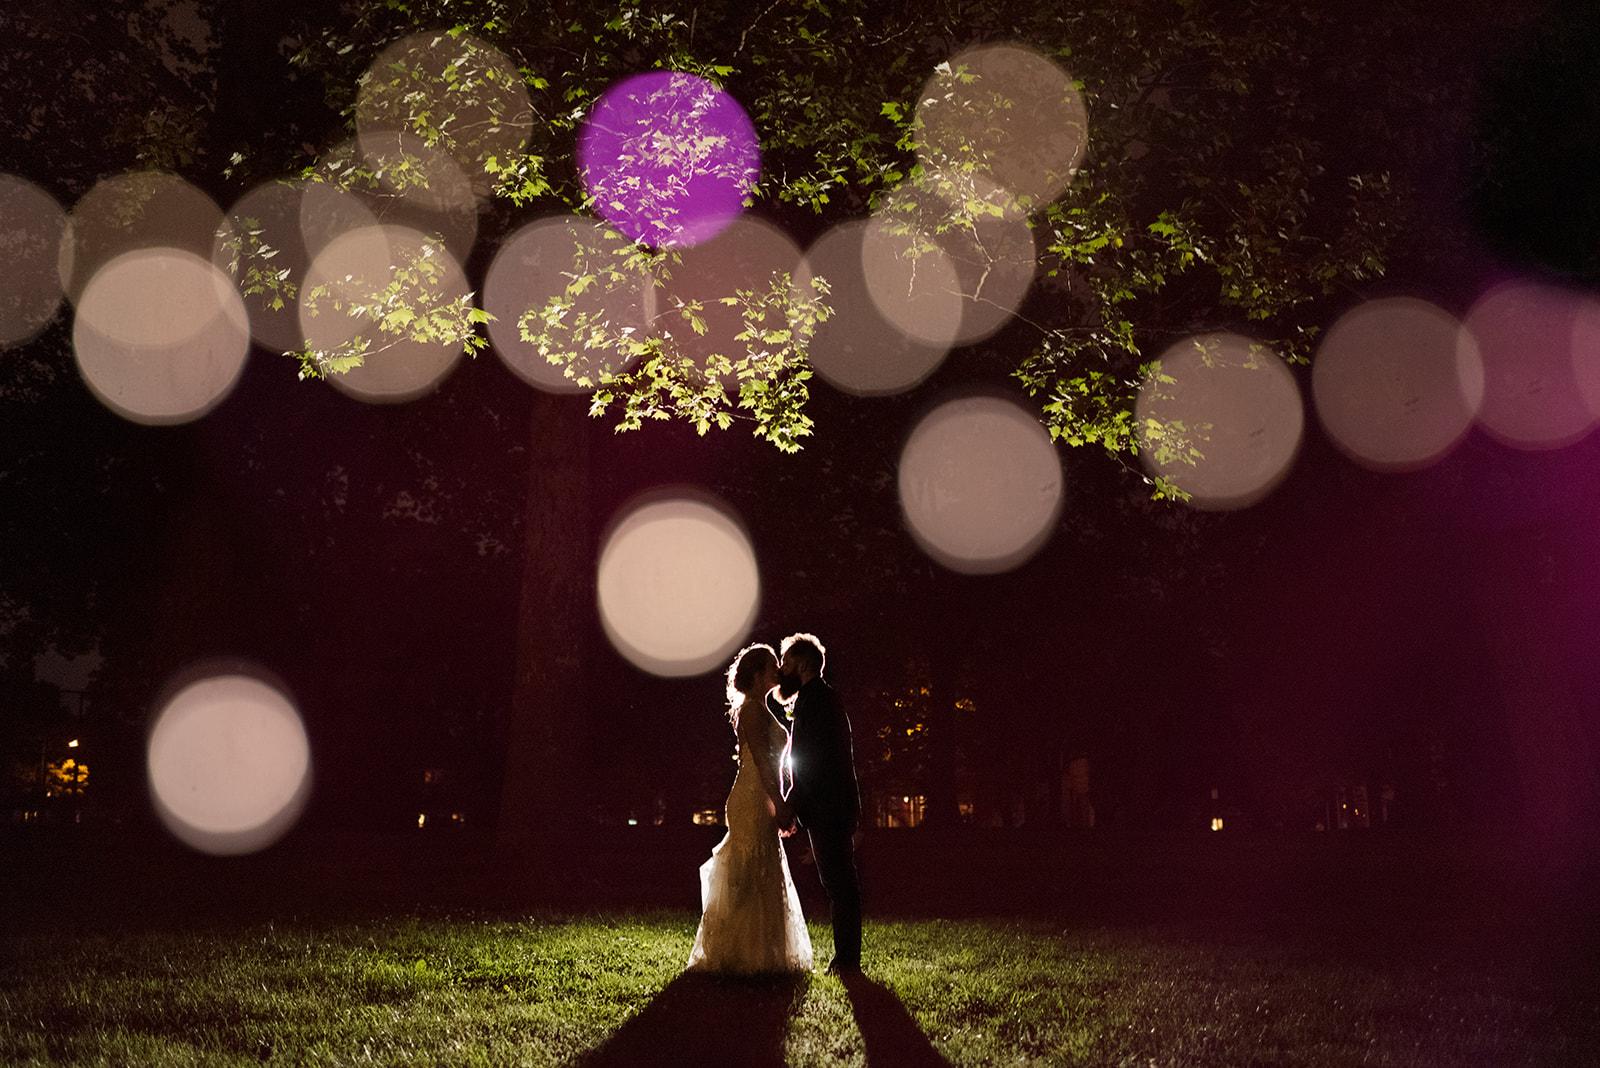 Nighttime wedding photo ideas: Nashville wedding at Clementine featured on Nashville Bride Guide